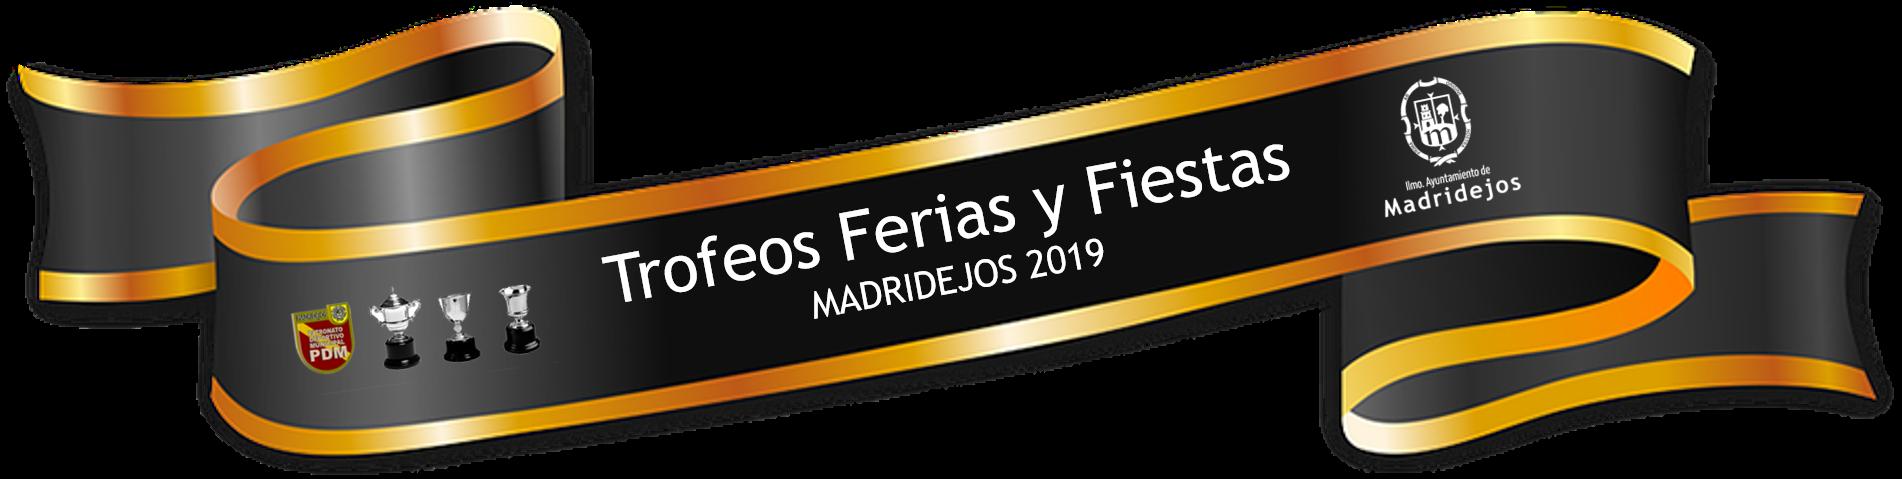 competiciones deportivas feria 2019 madridejos